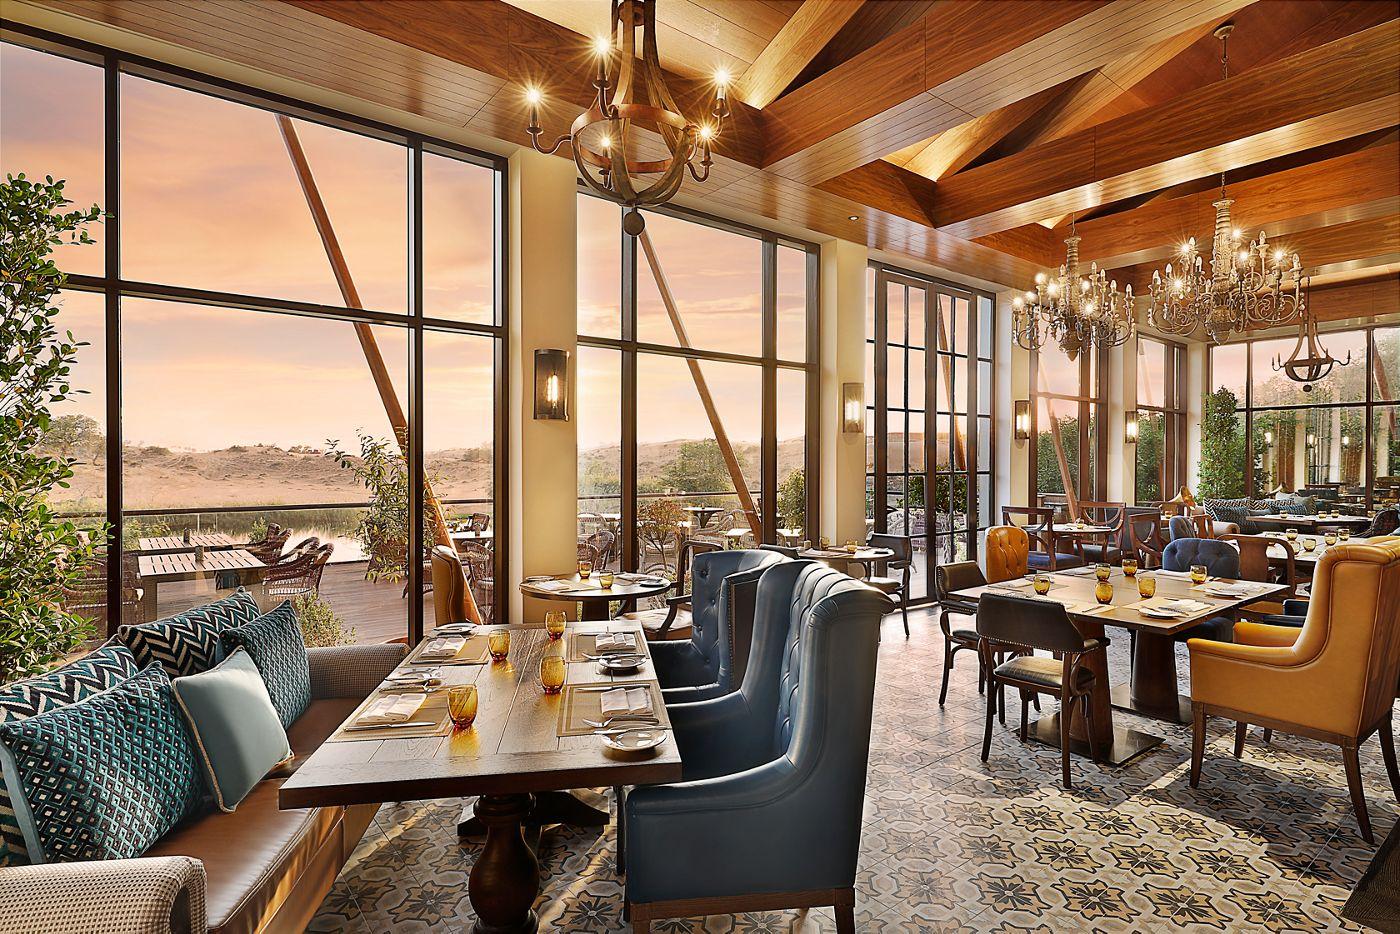 Ritz Carlton Rash Al Khaimah - luxul deşertului,, foto@ritzcarlton.com